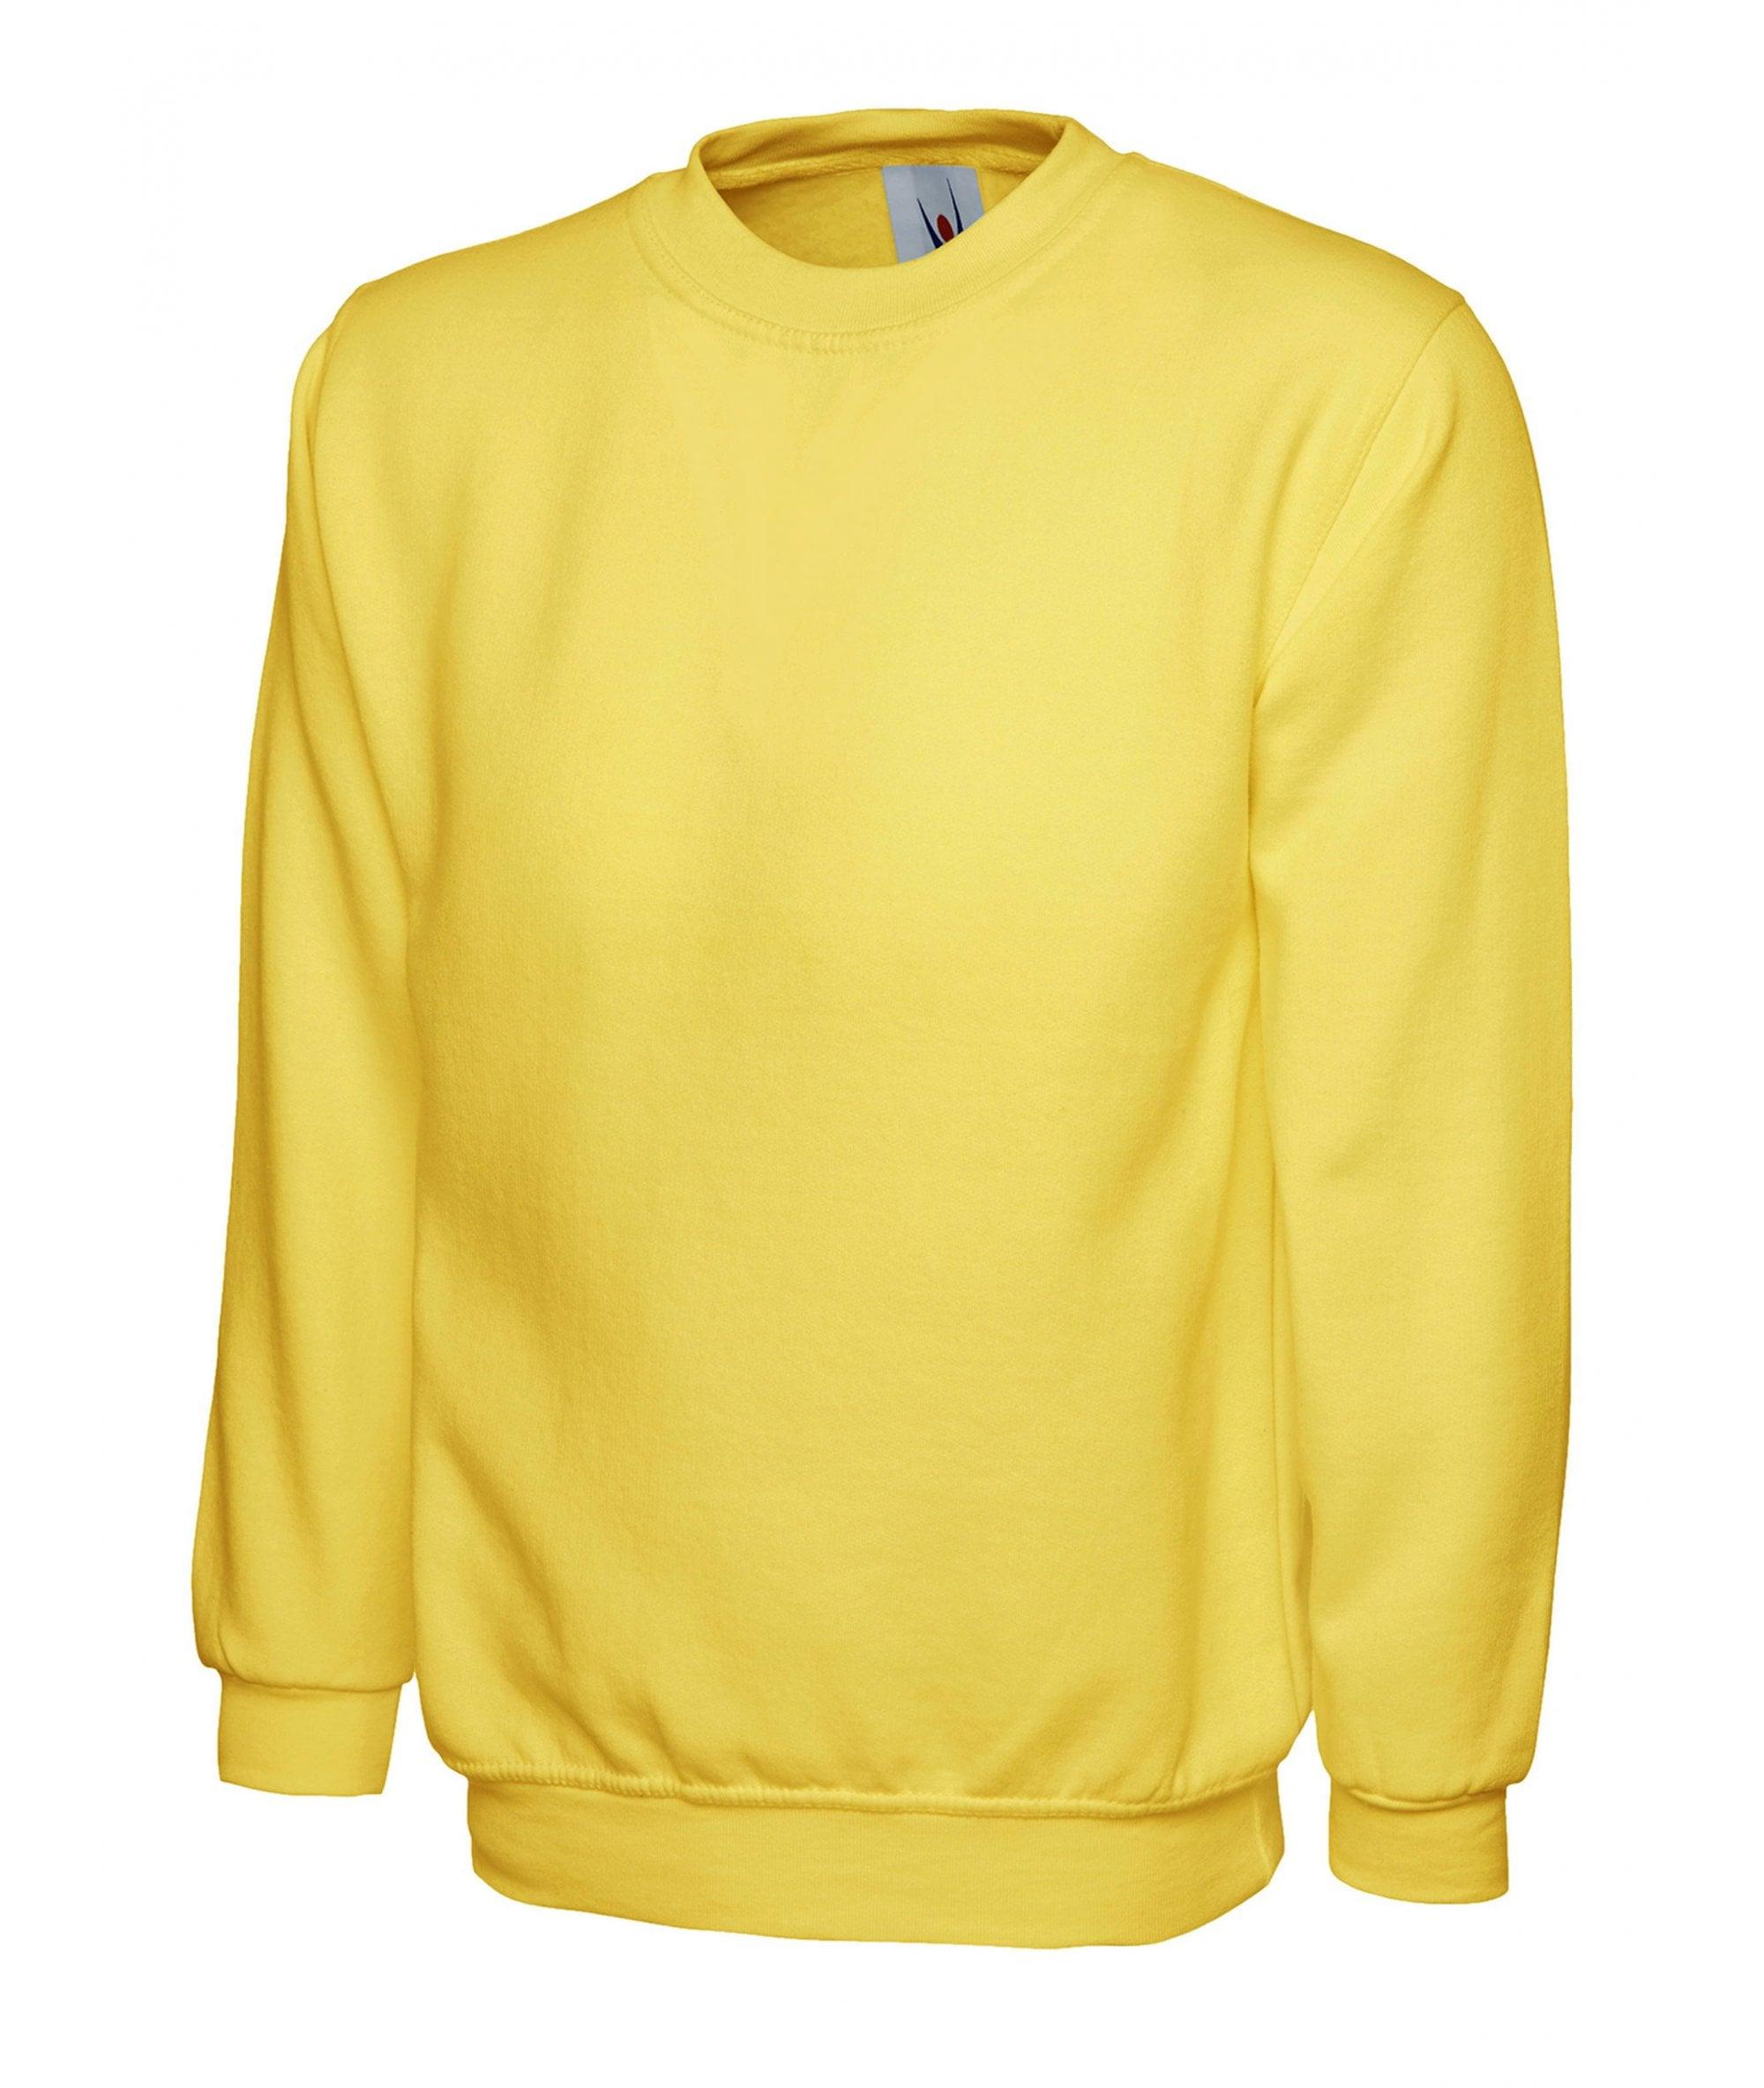 **NEW** Mens Big Size UNEEK Classic Light Grey Sweatshirt 3XL /& 4XL